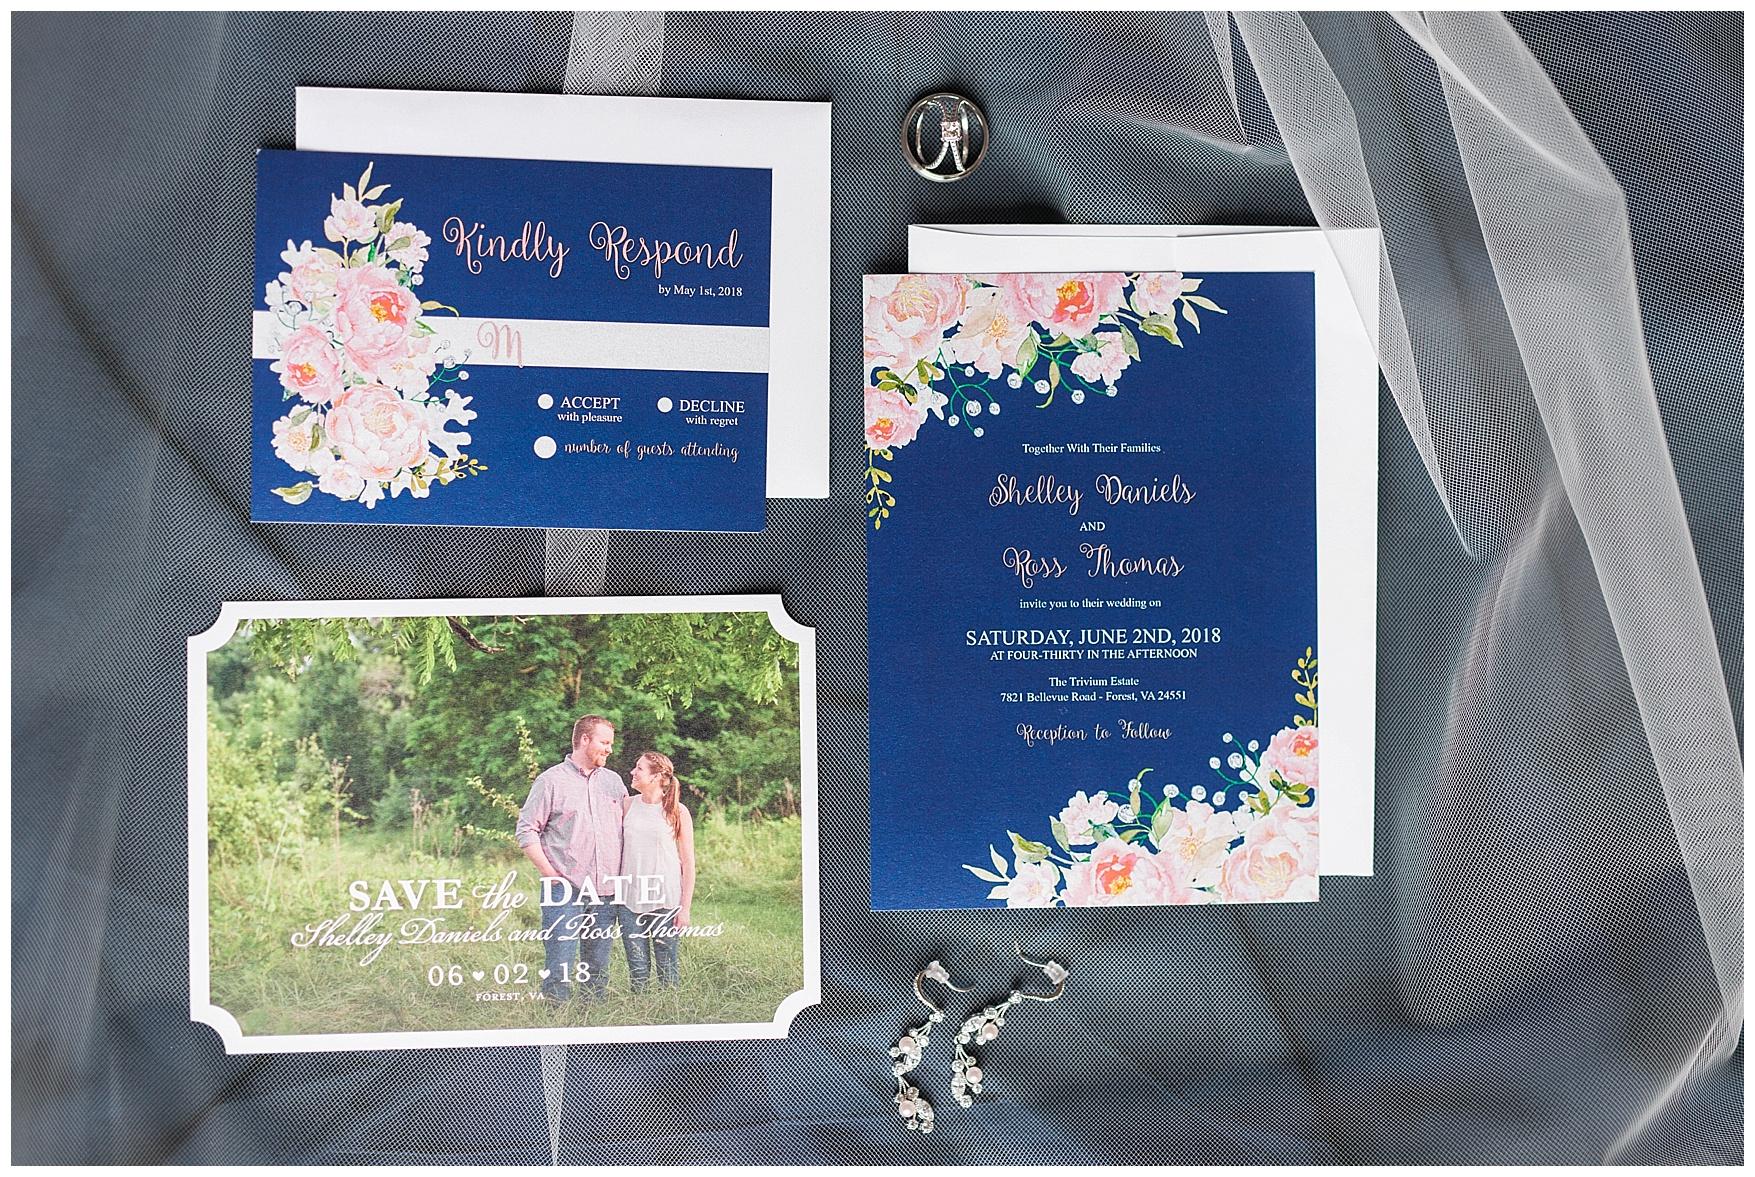 Rainy Summer Wedding at The Trivium Estate in Lynchburg, VA    Lynchburg, VA Wedding Photographer